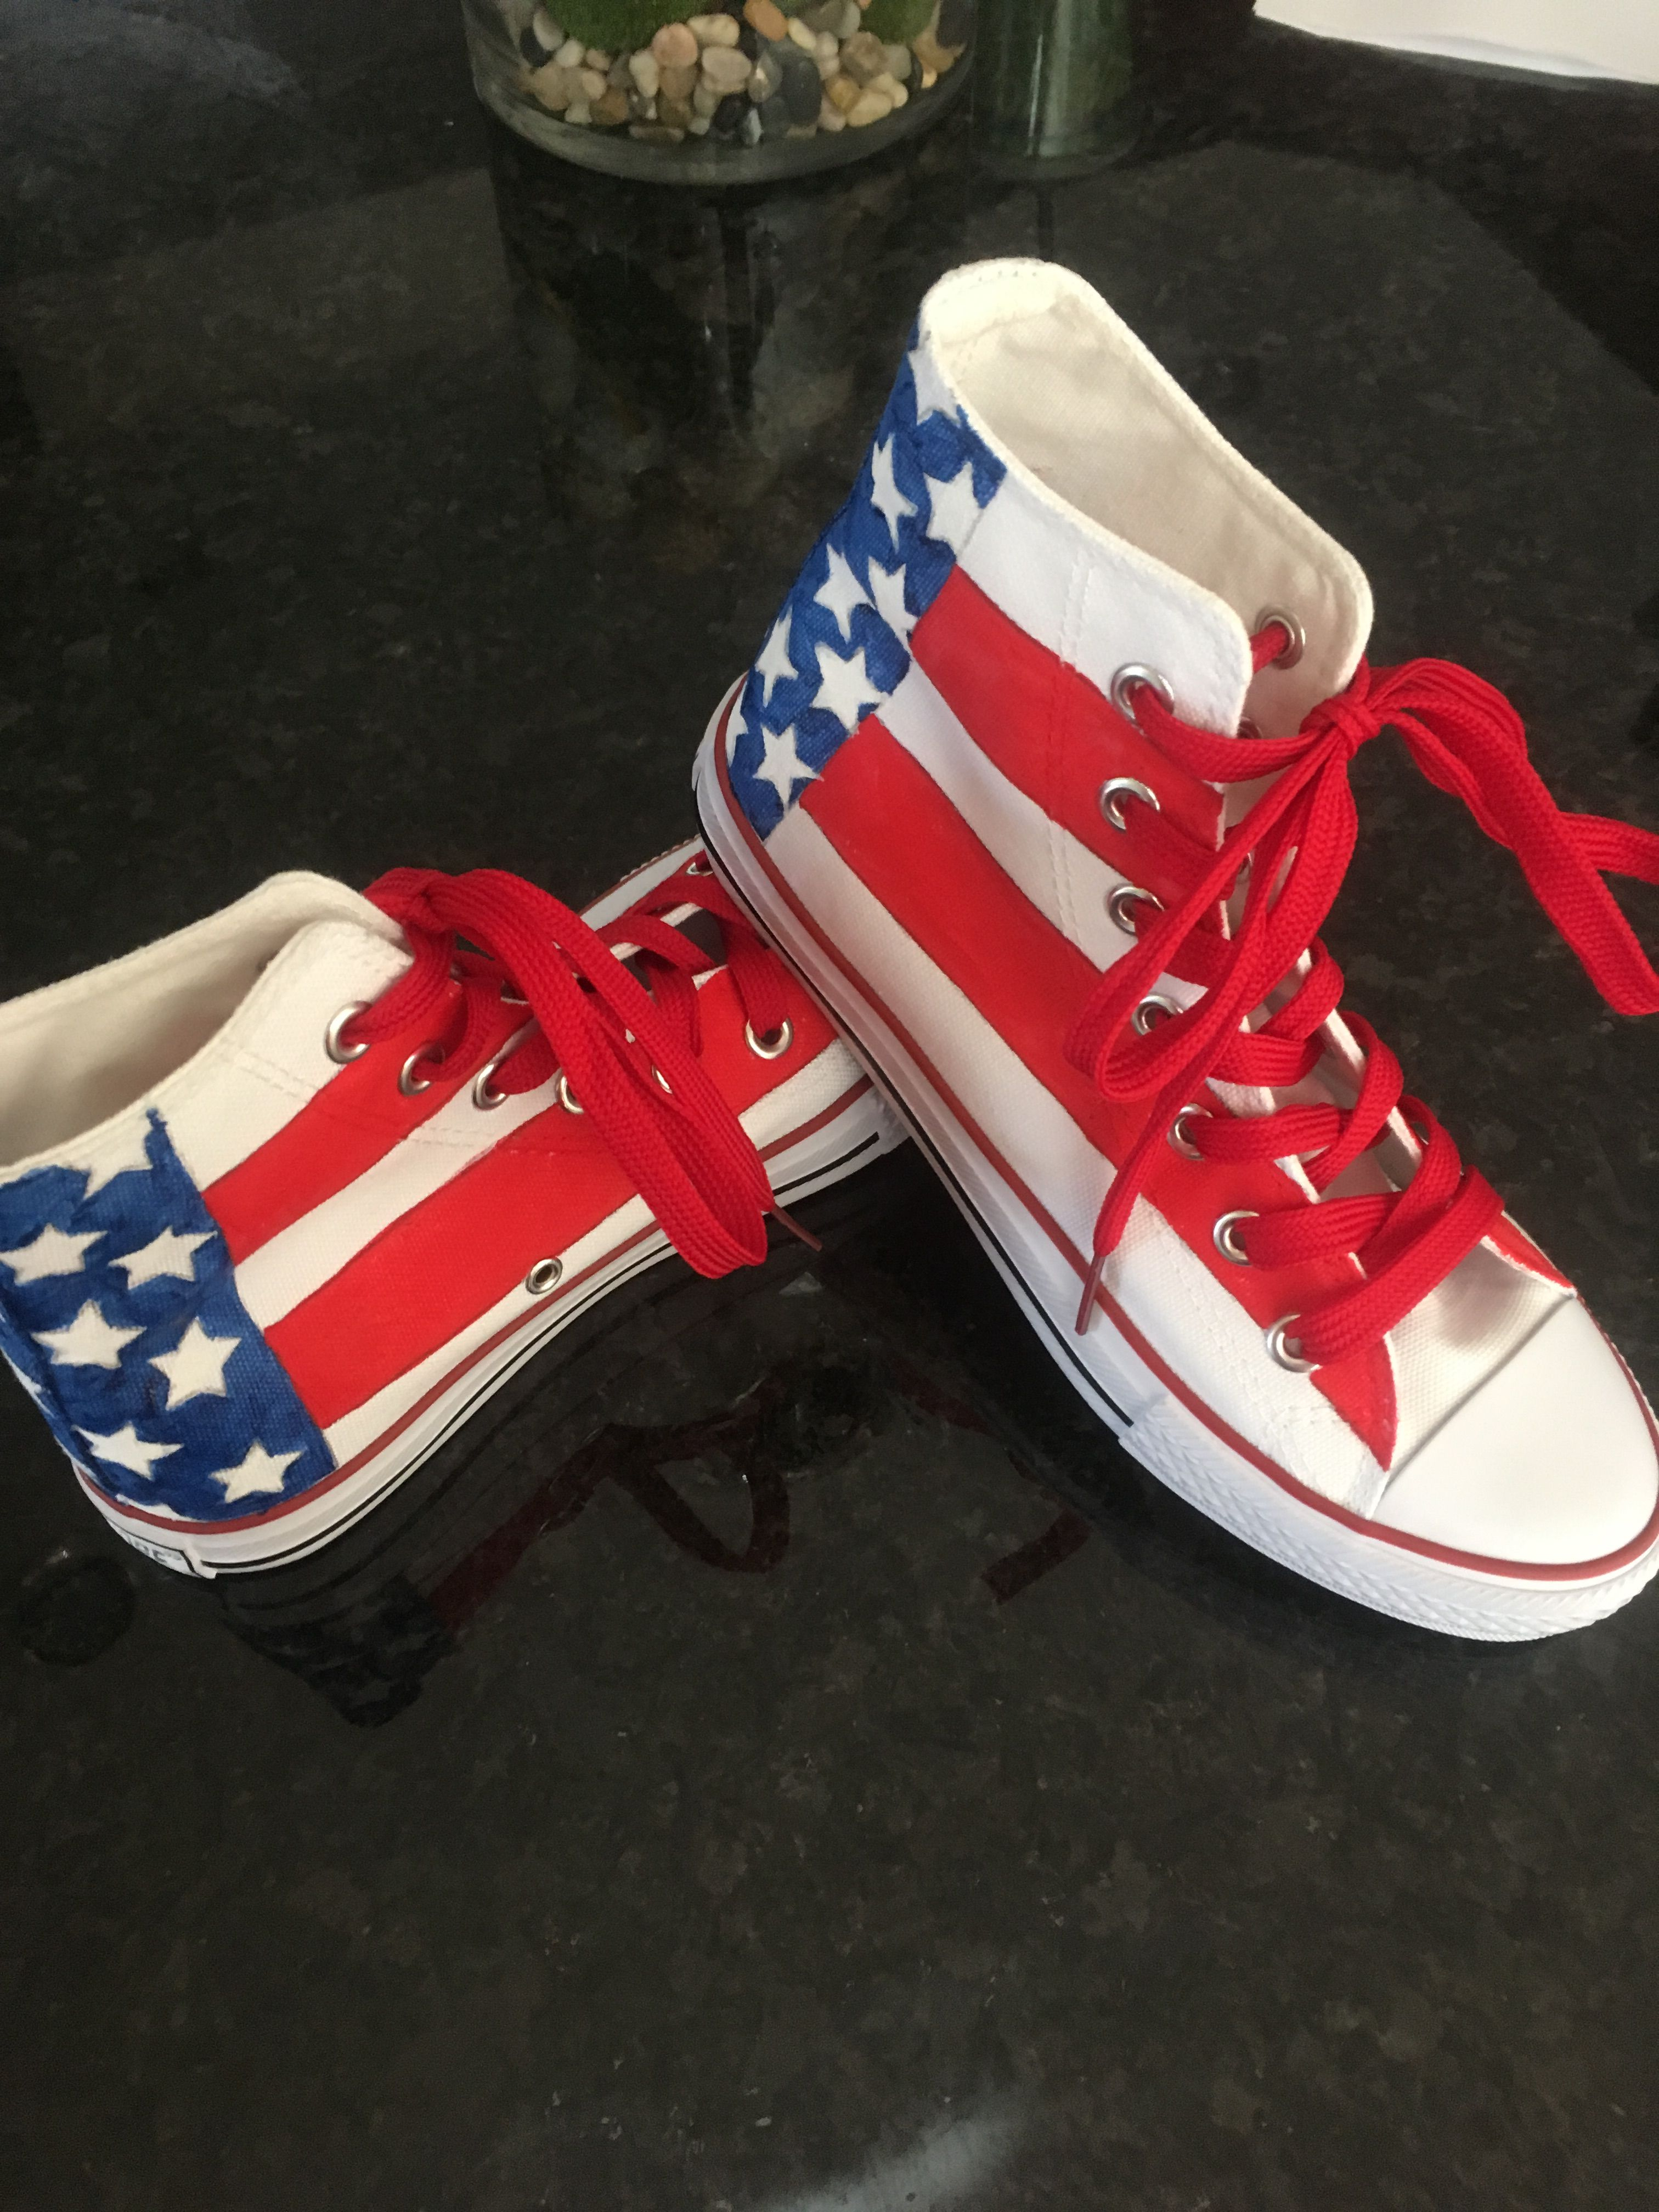 American Flag Painted Tennis Shoes Vans High Top Sneaker American Flag Painting Sneakers